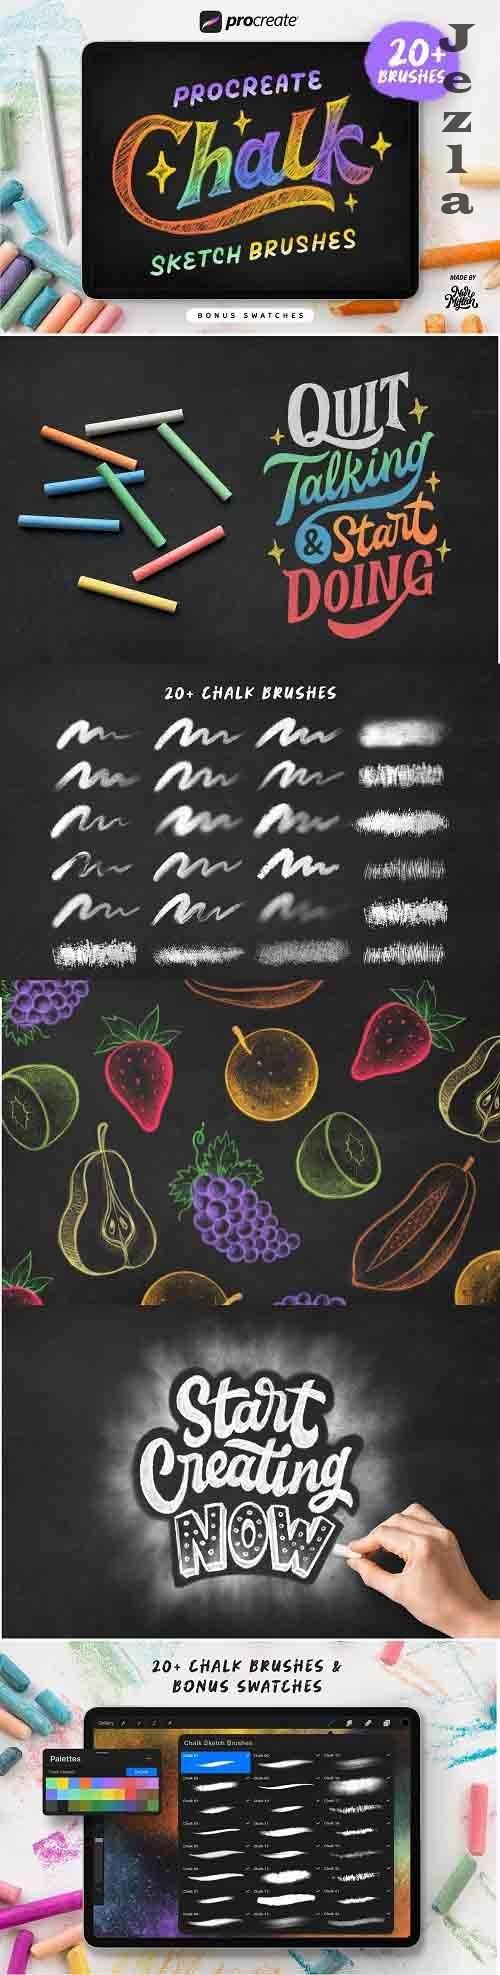 Procreate Chalk Sketch Brushes - 6217127